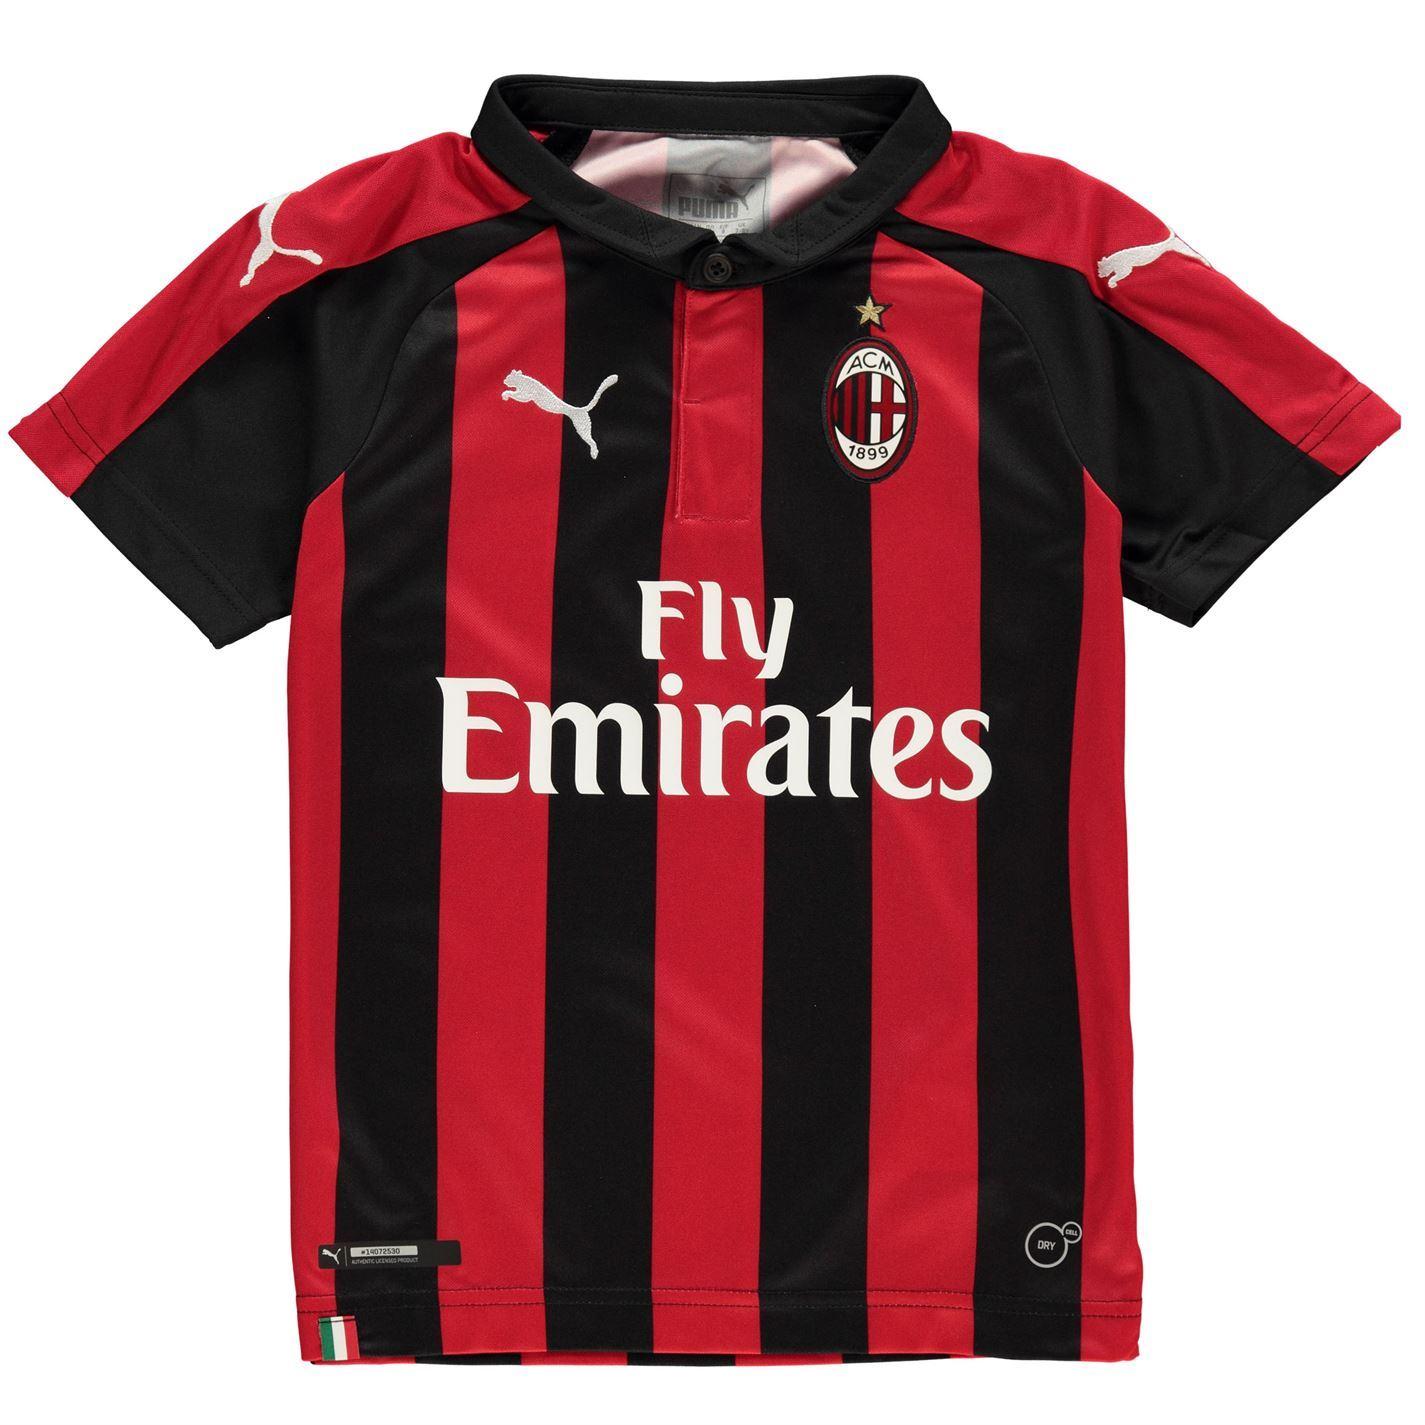 new style 9d008 3532e Details about Puma AC Milan Home Jersey 2018 2019 Juniors Red/Black  Football Soccer Shirt Top